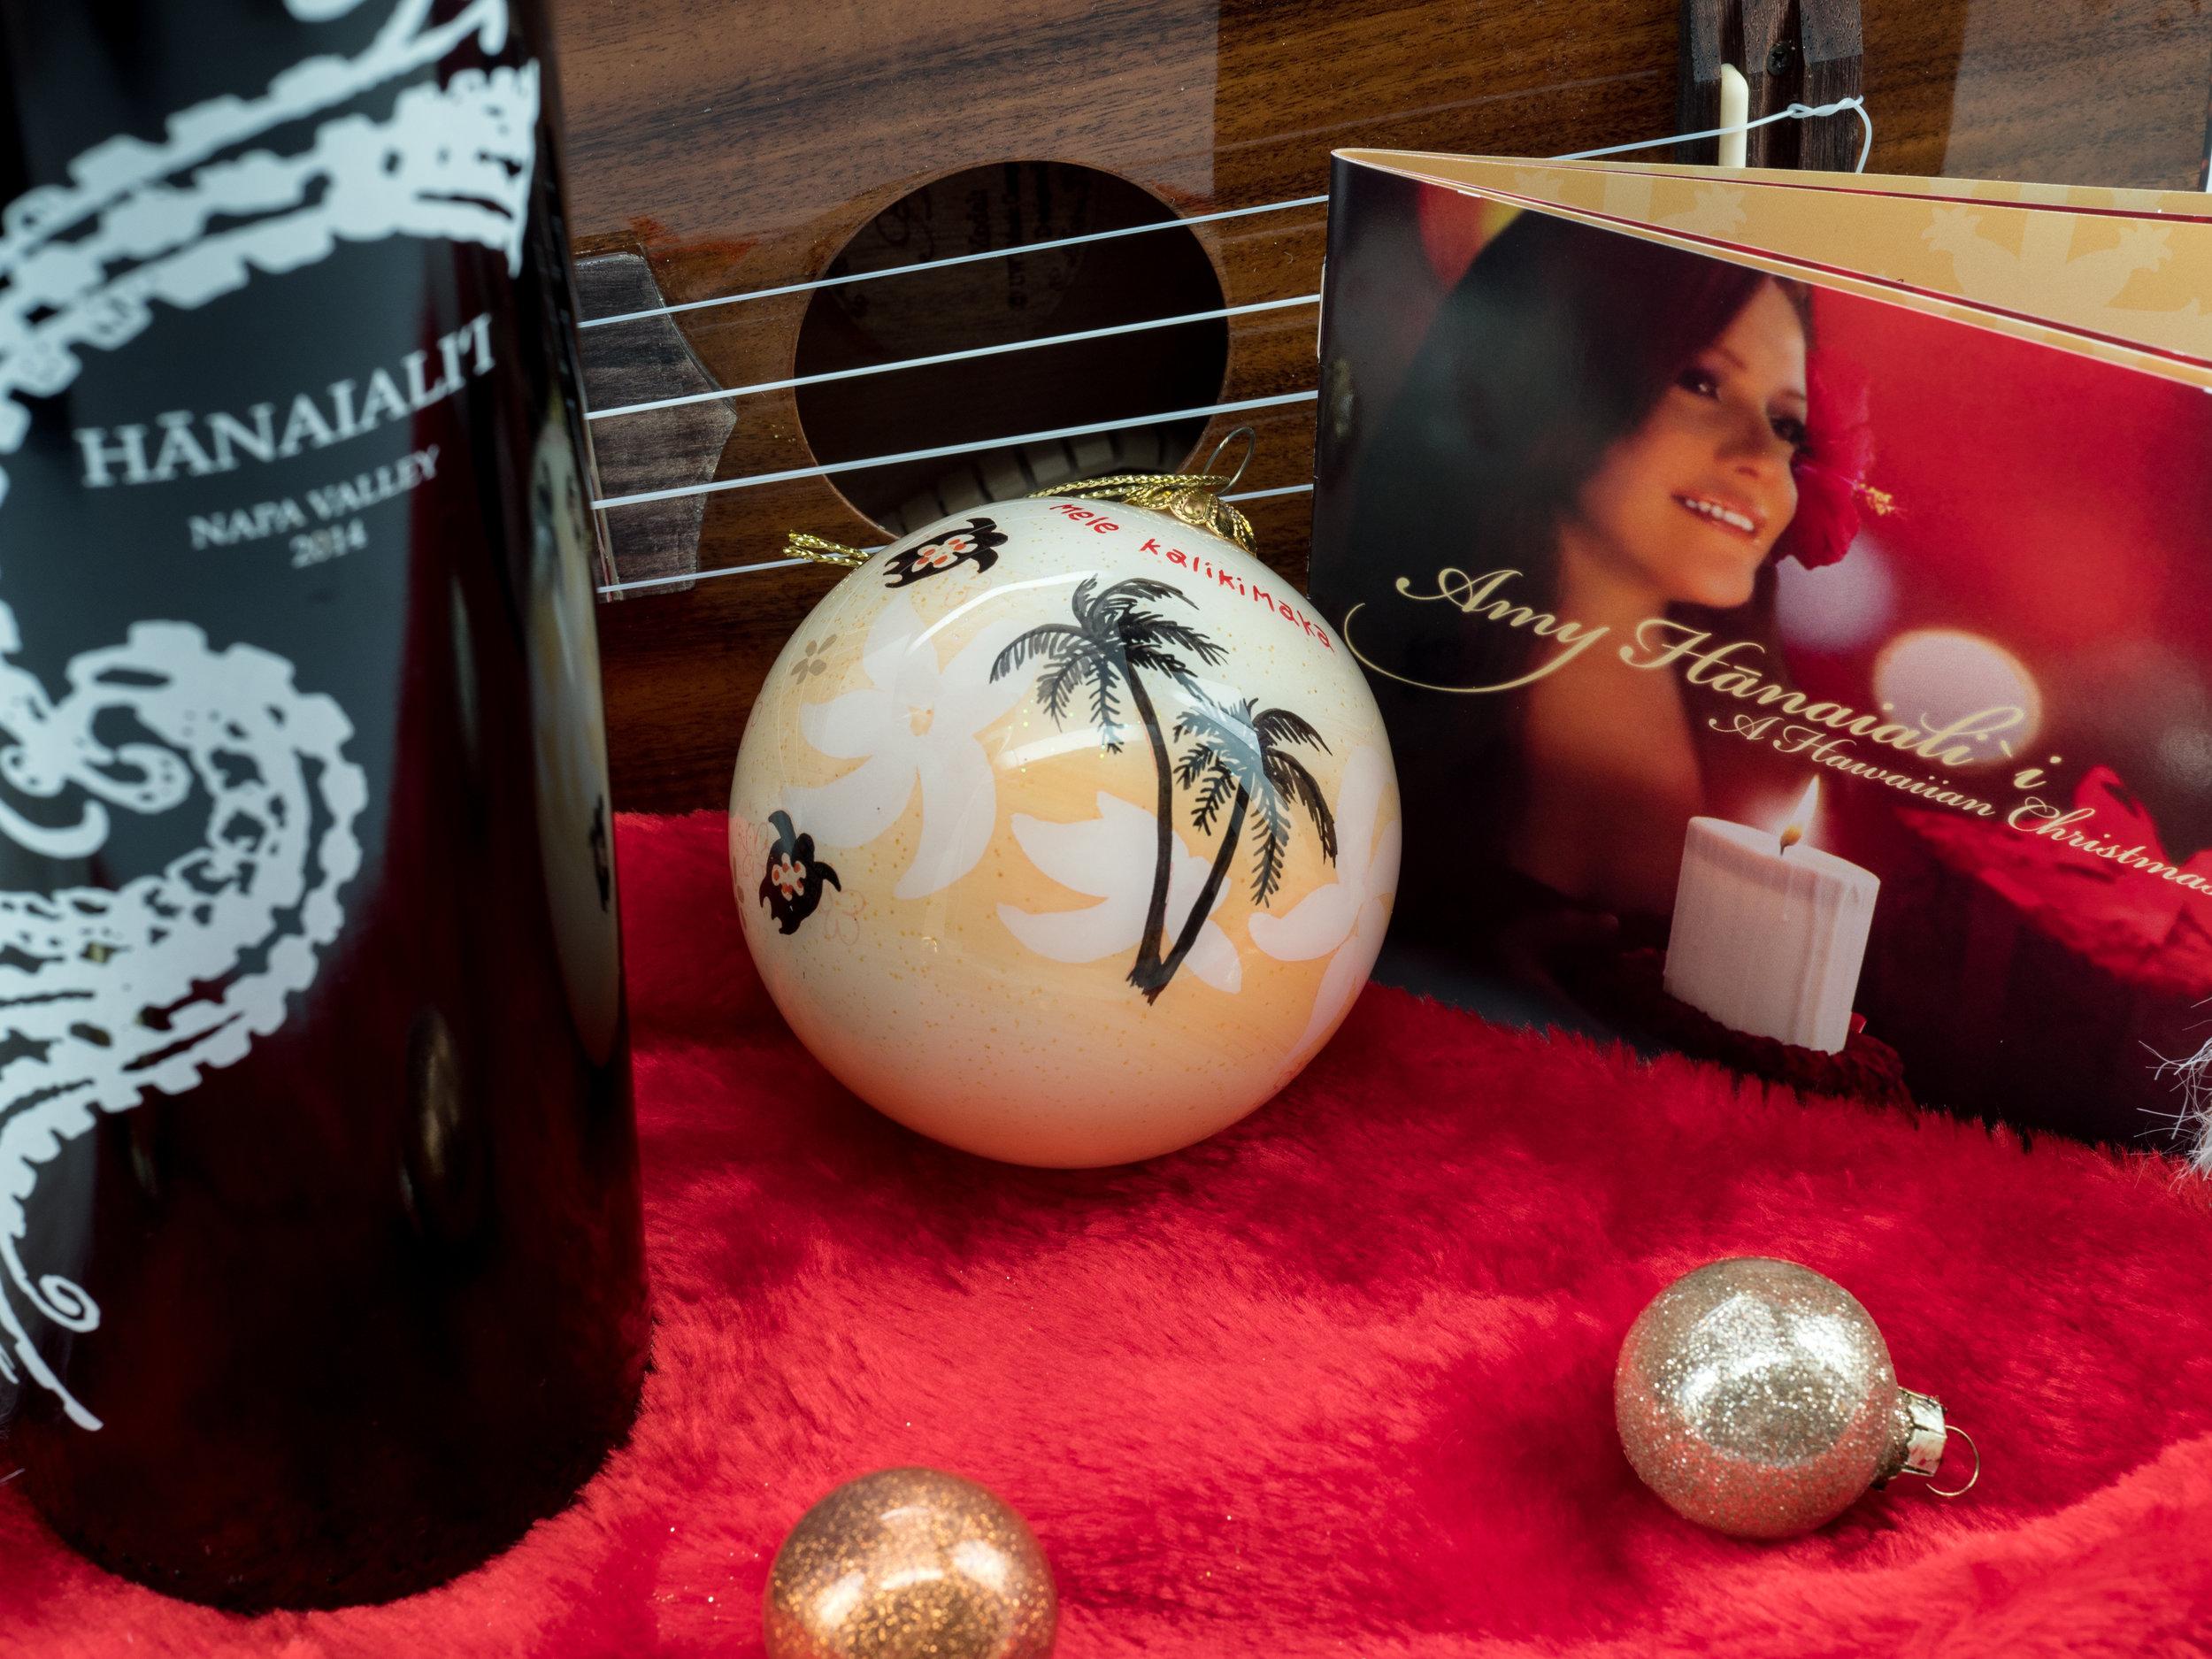 Musings by the Glass - Mele Kalikimaka - Hawaiian Christmas Music and Wine Pairings - Amy Hanaialii Christmas Album and 2014 Hanaialii Merlot from Napa Valley California